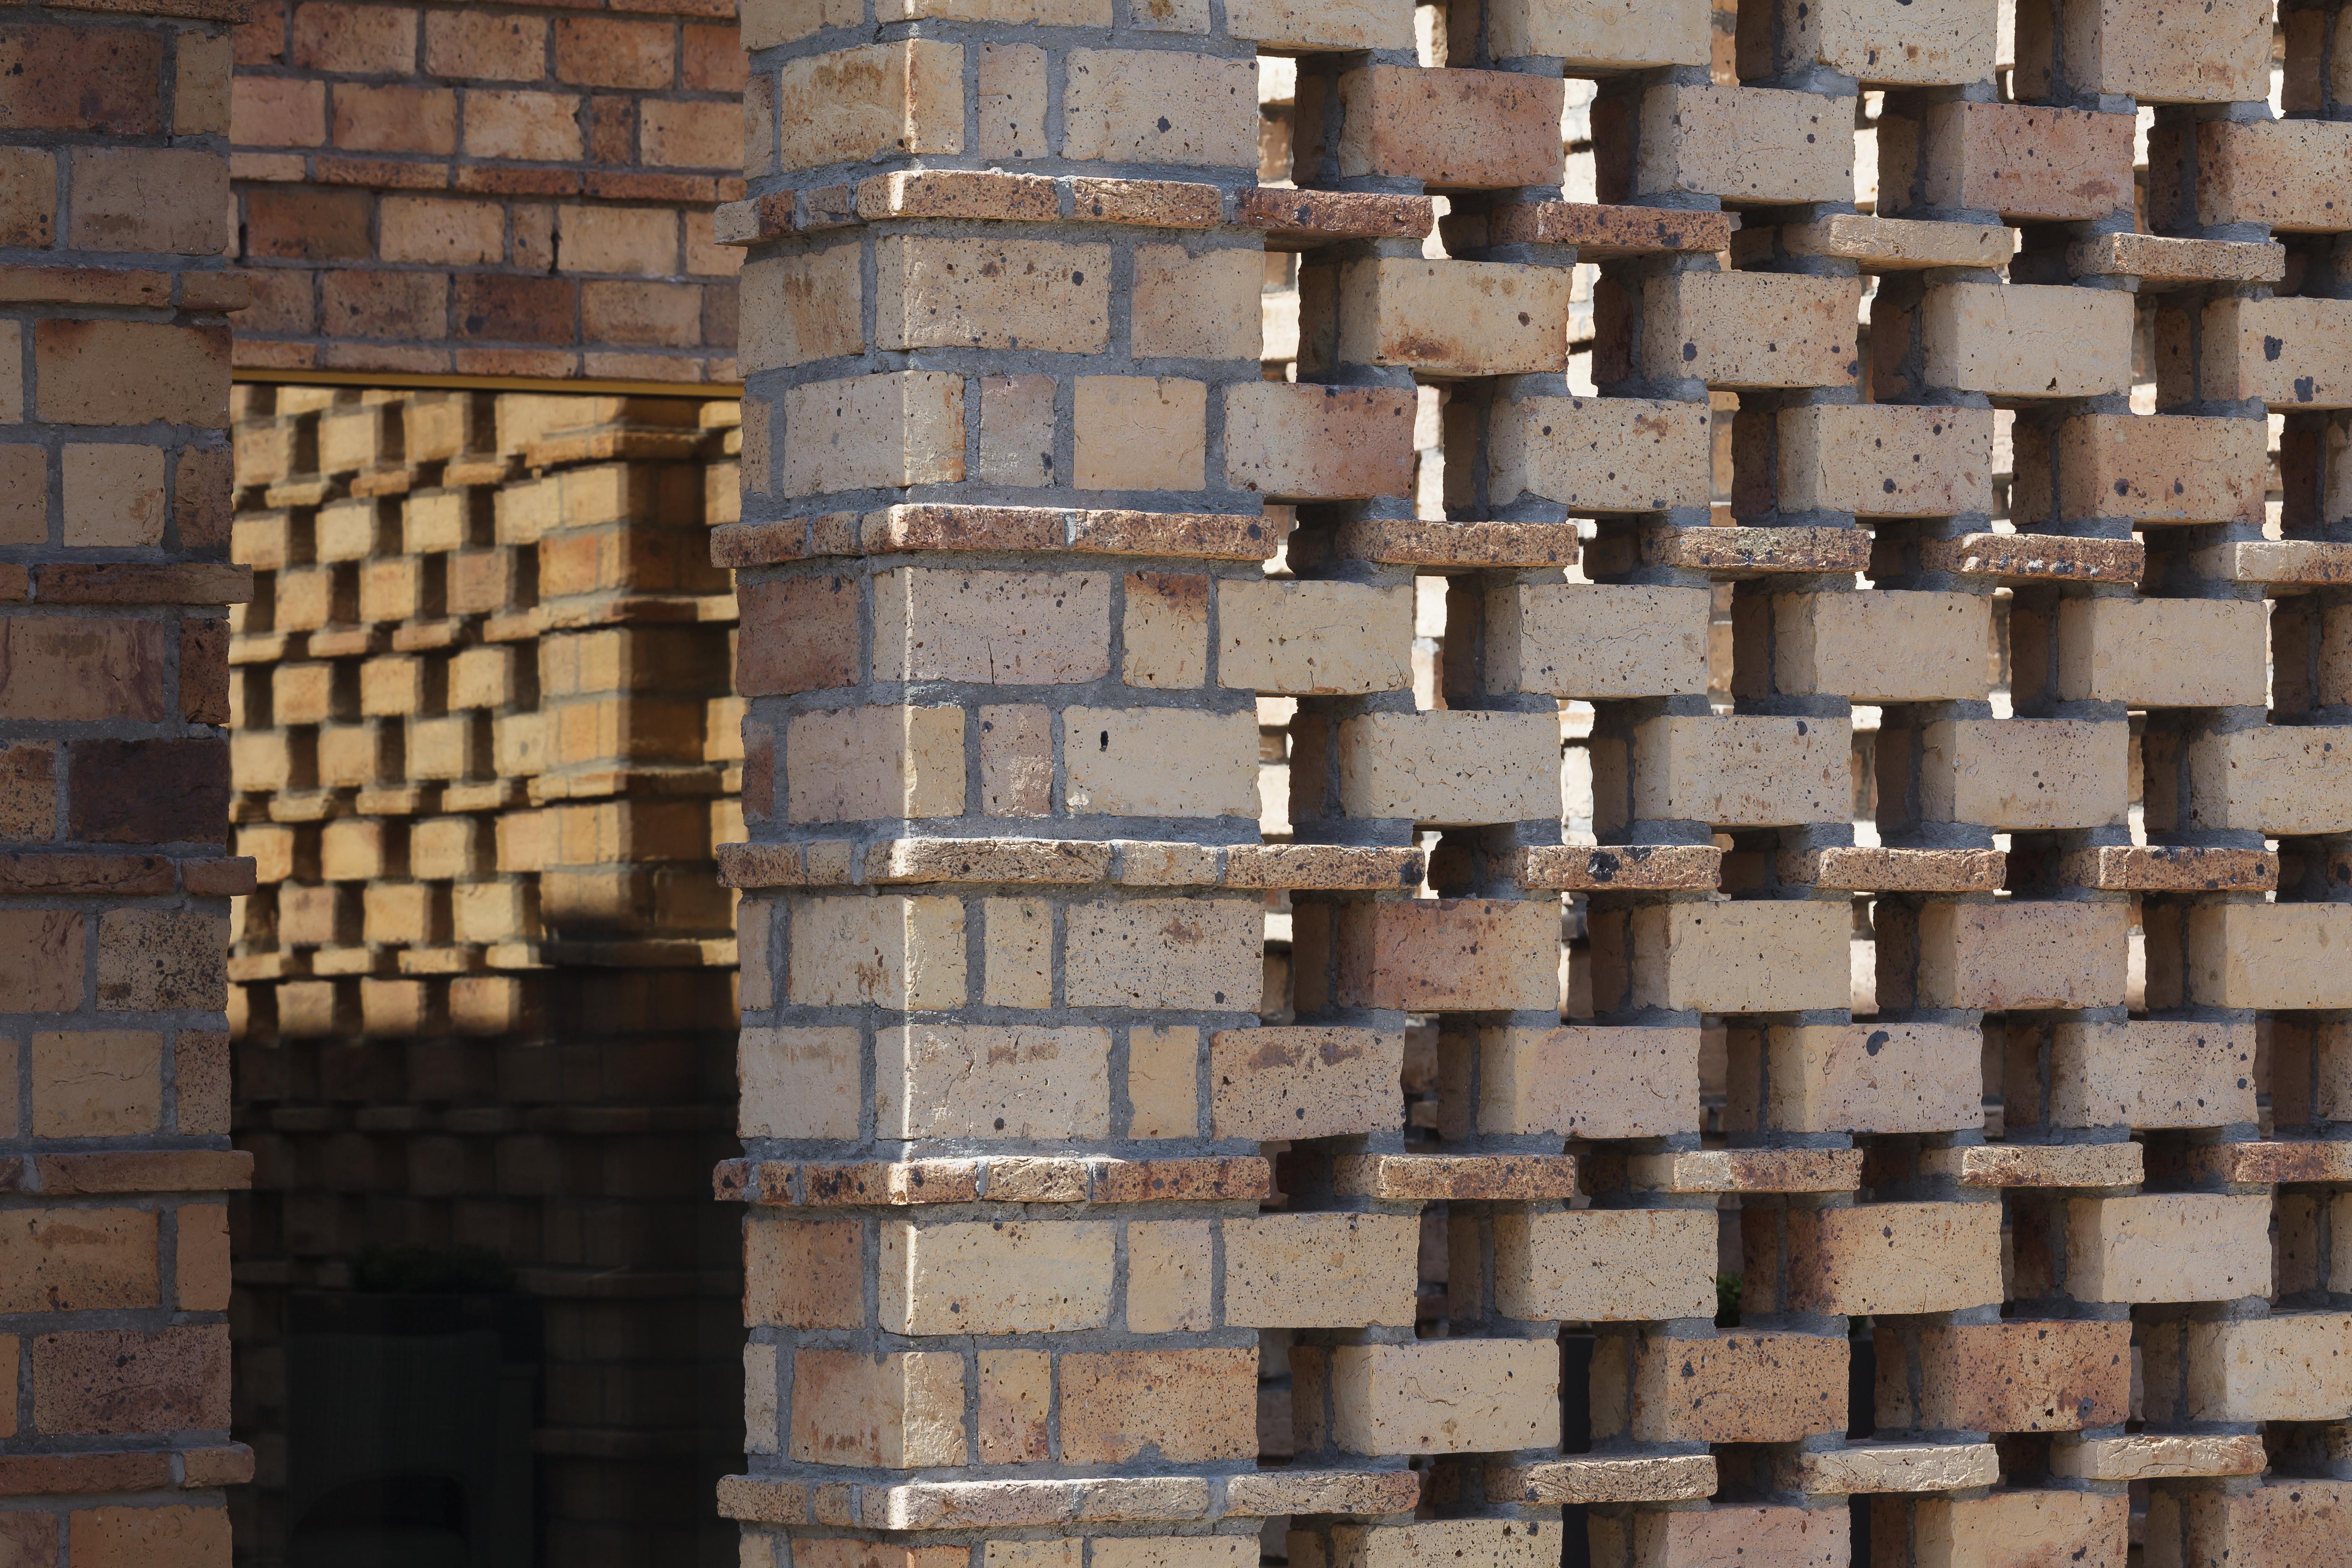 <p>Beeld Stijn Bollaert, Crematorium, Lommel &#8211; a2o-architecten</p>